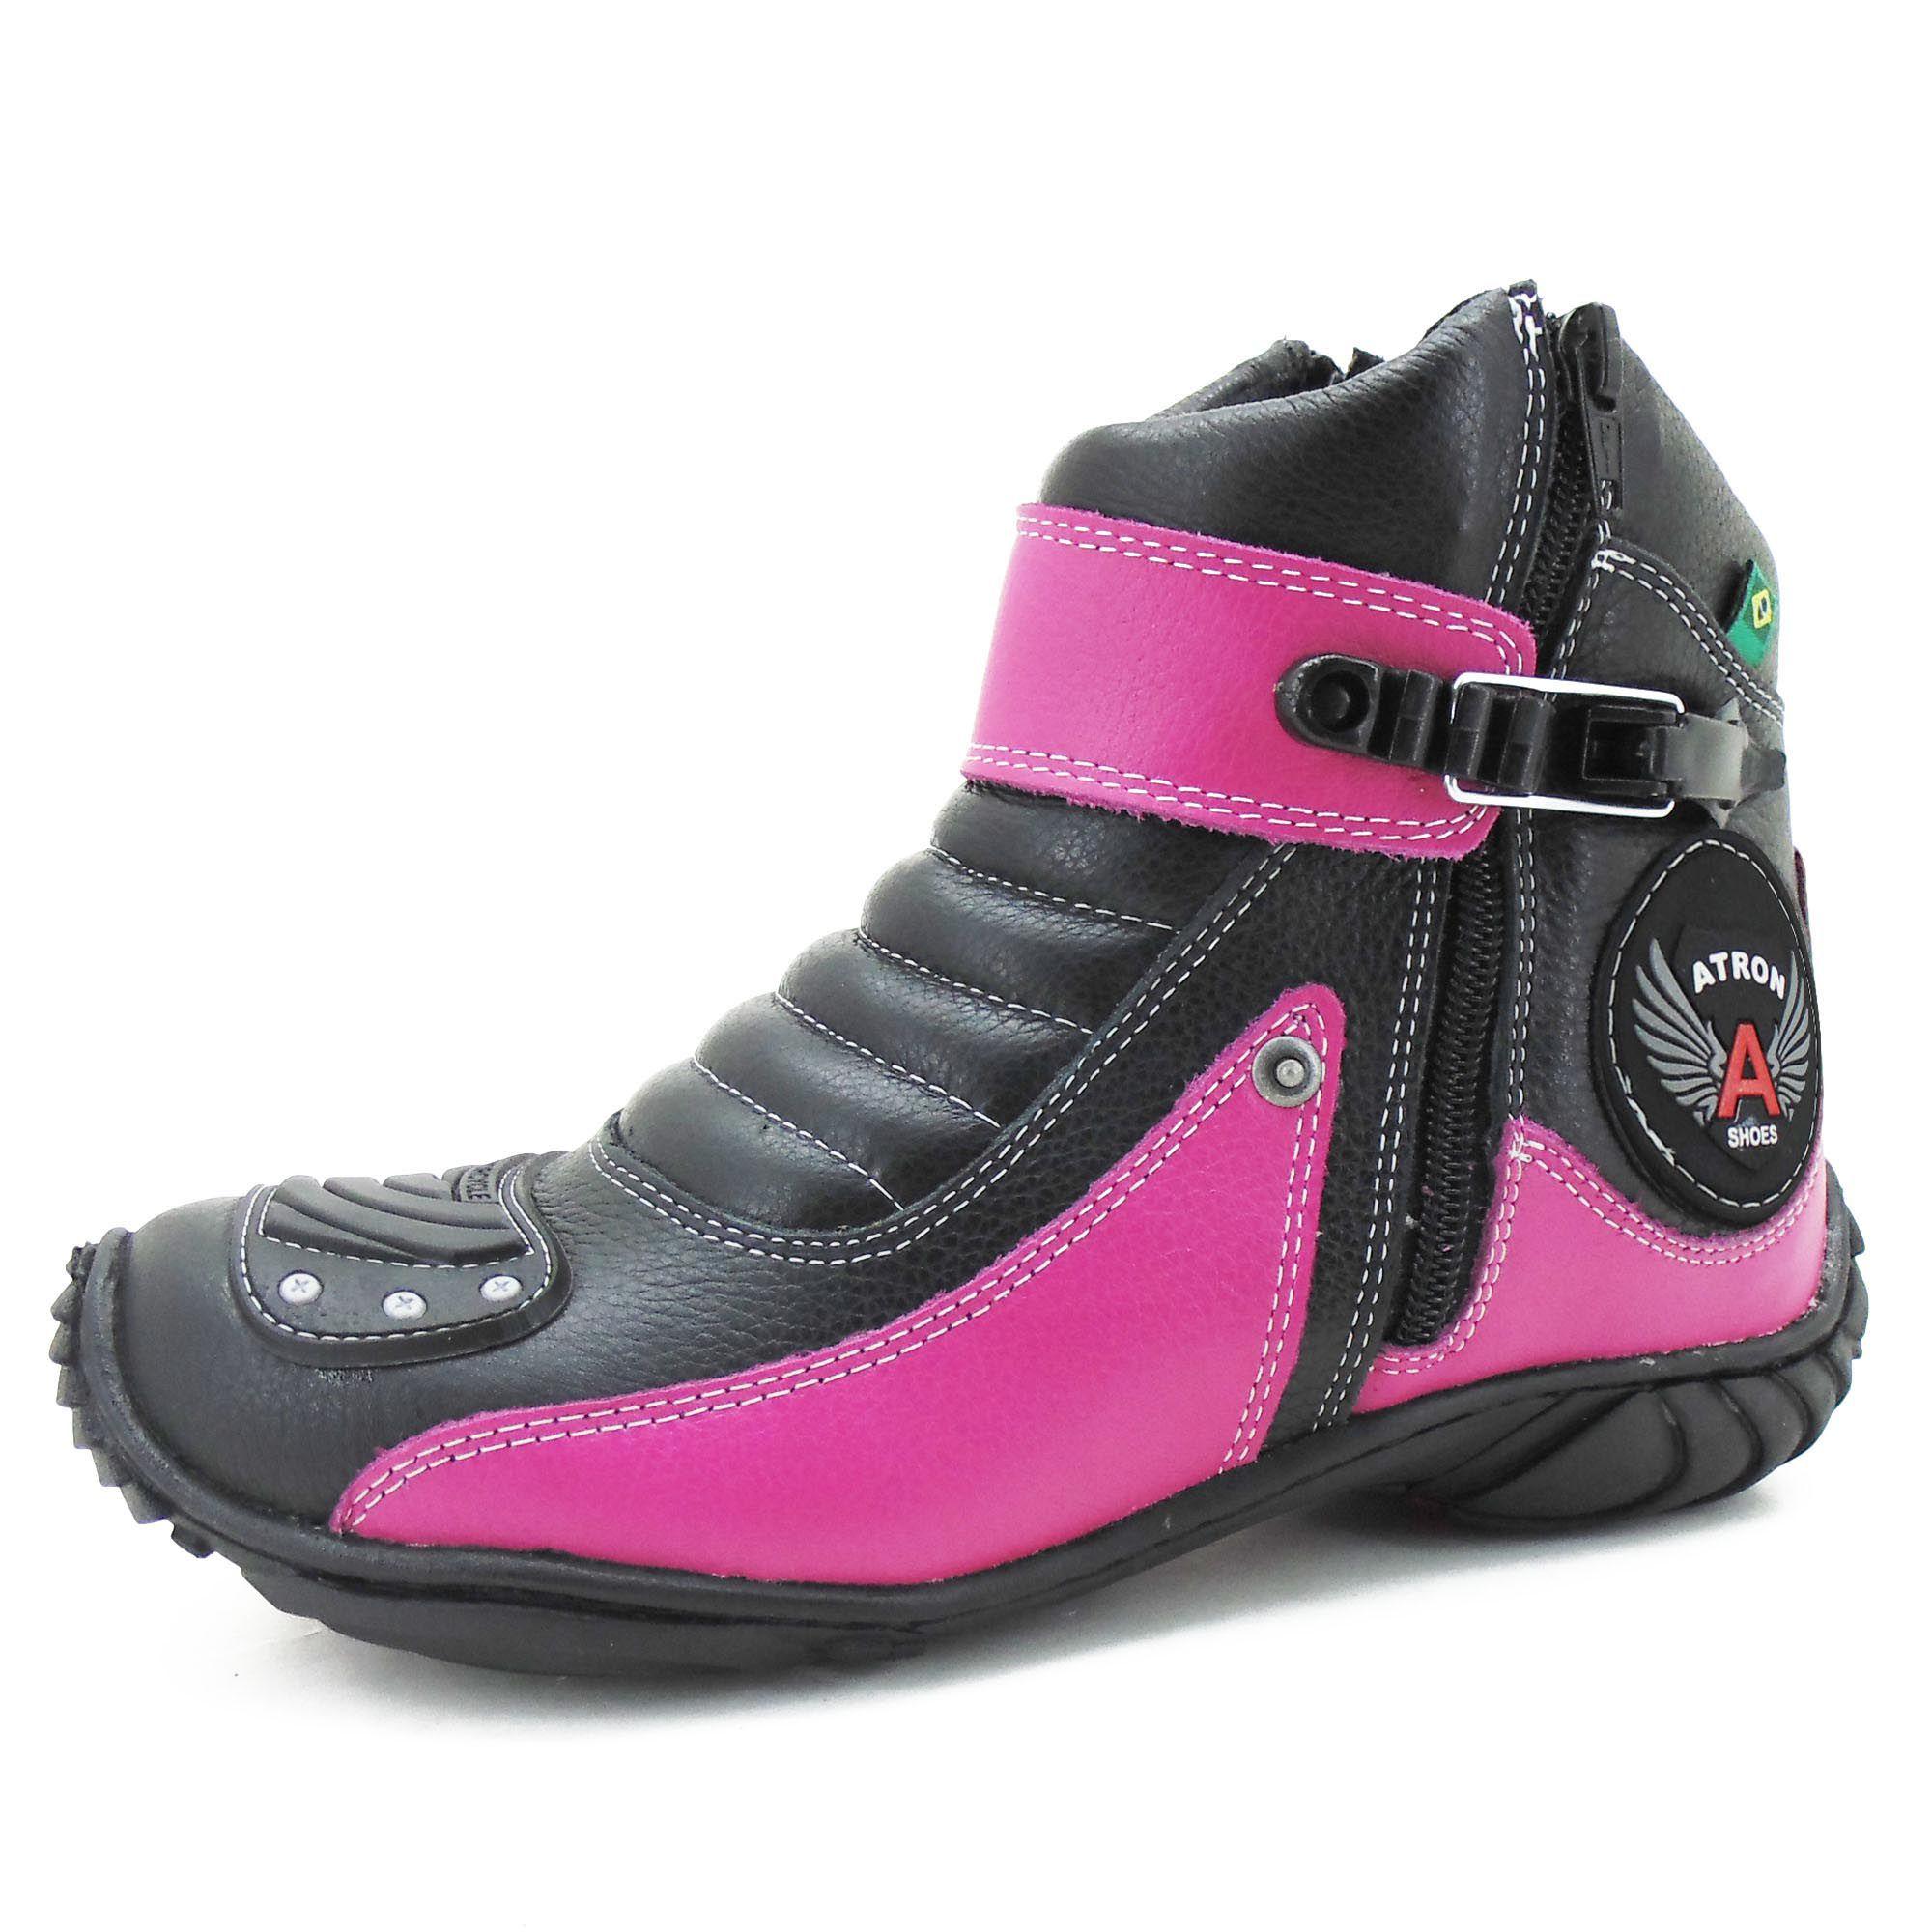 Bota Motociclista Couro Legítimo 271 Pink